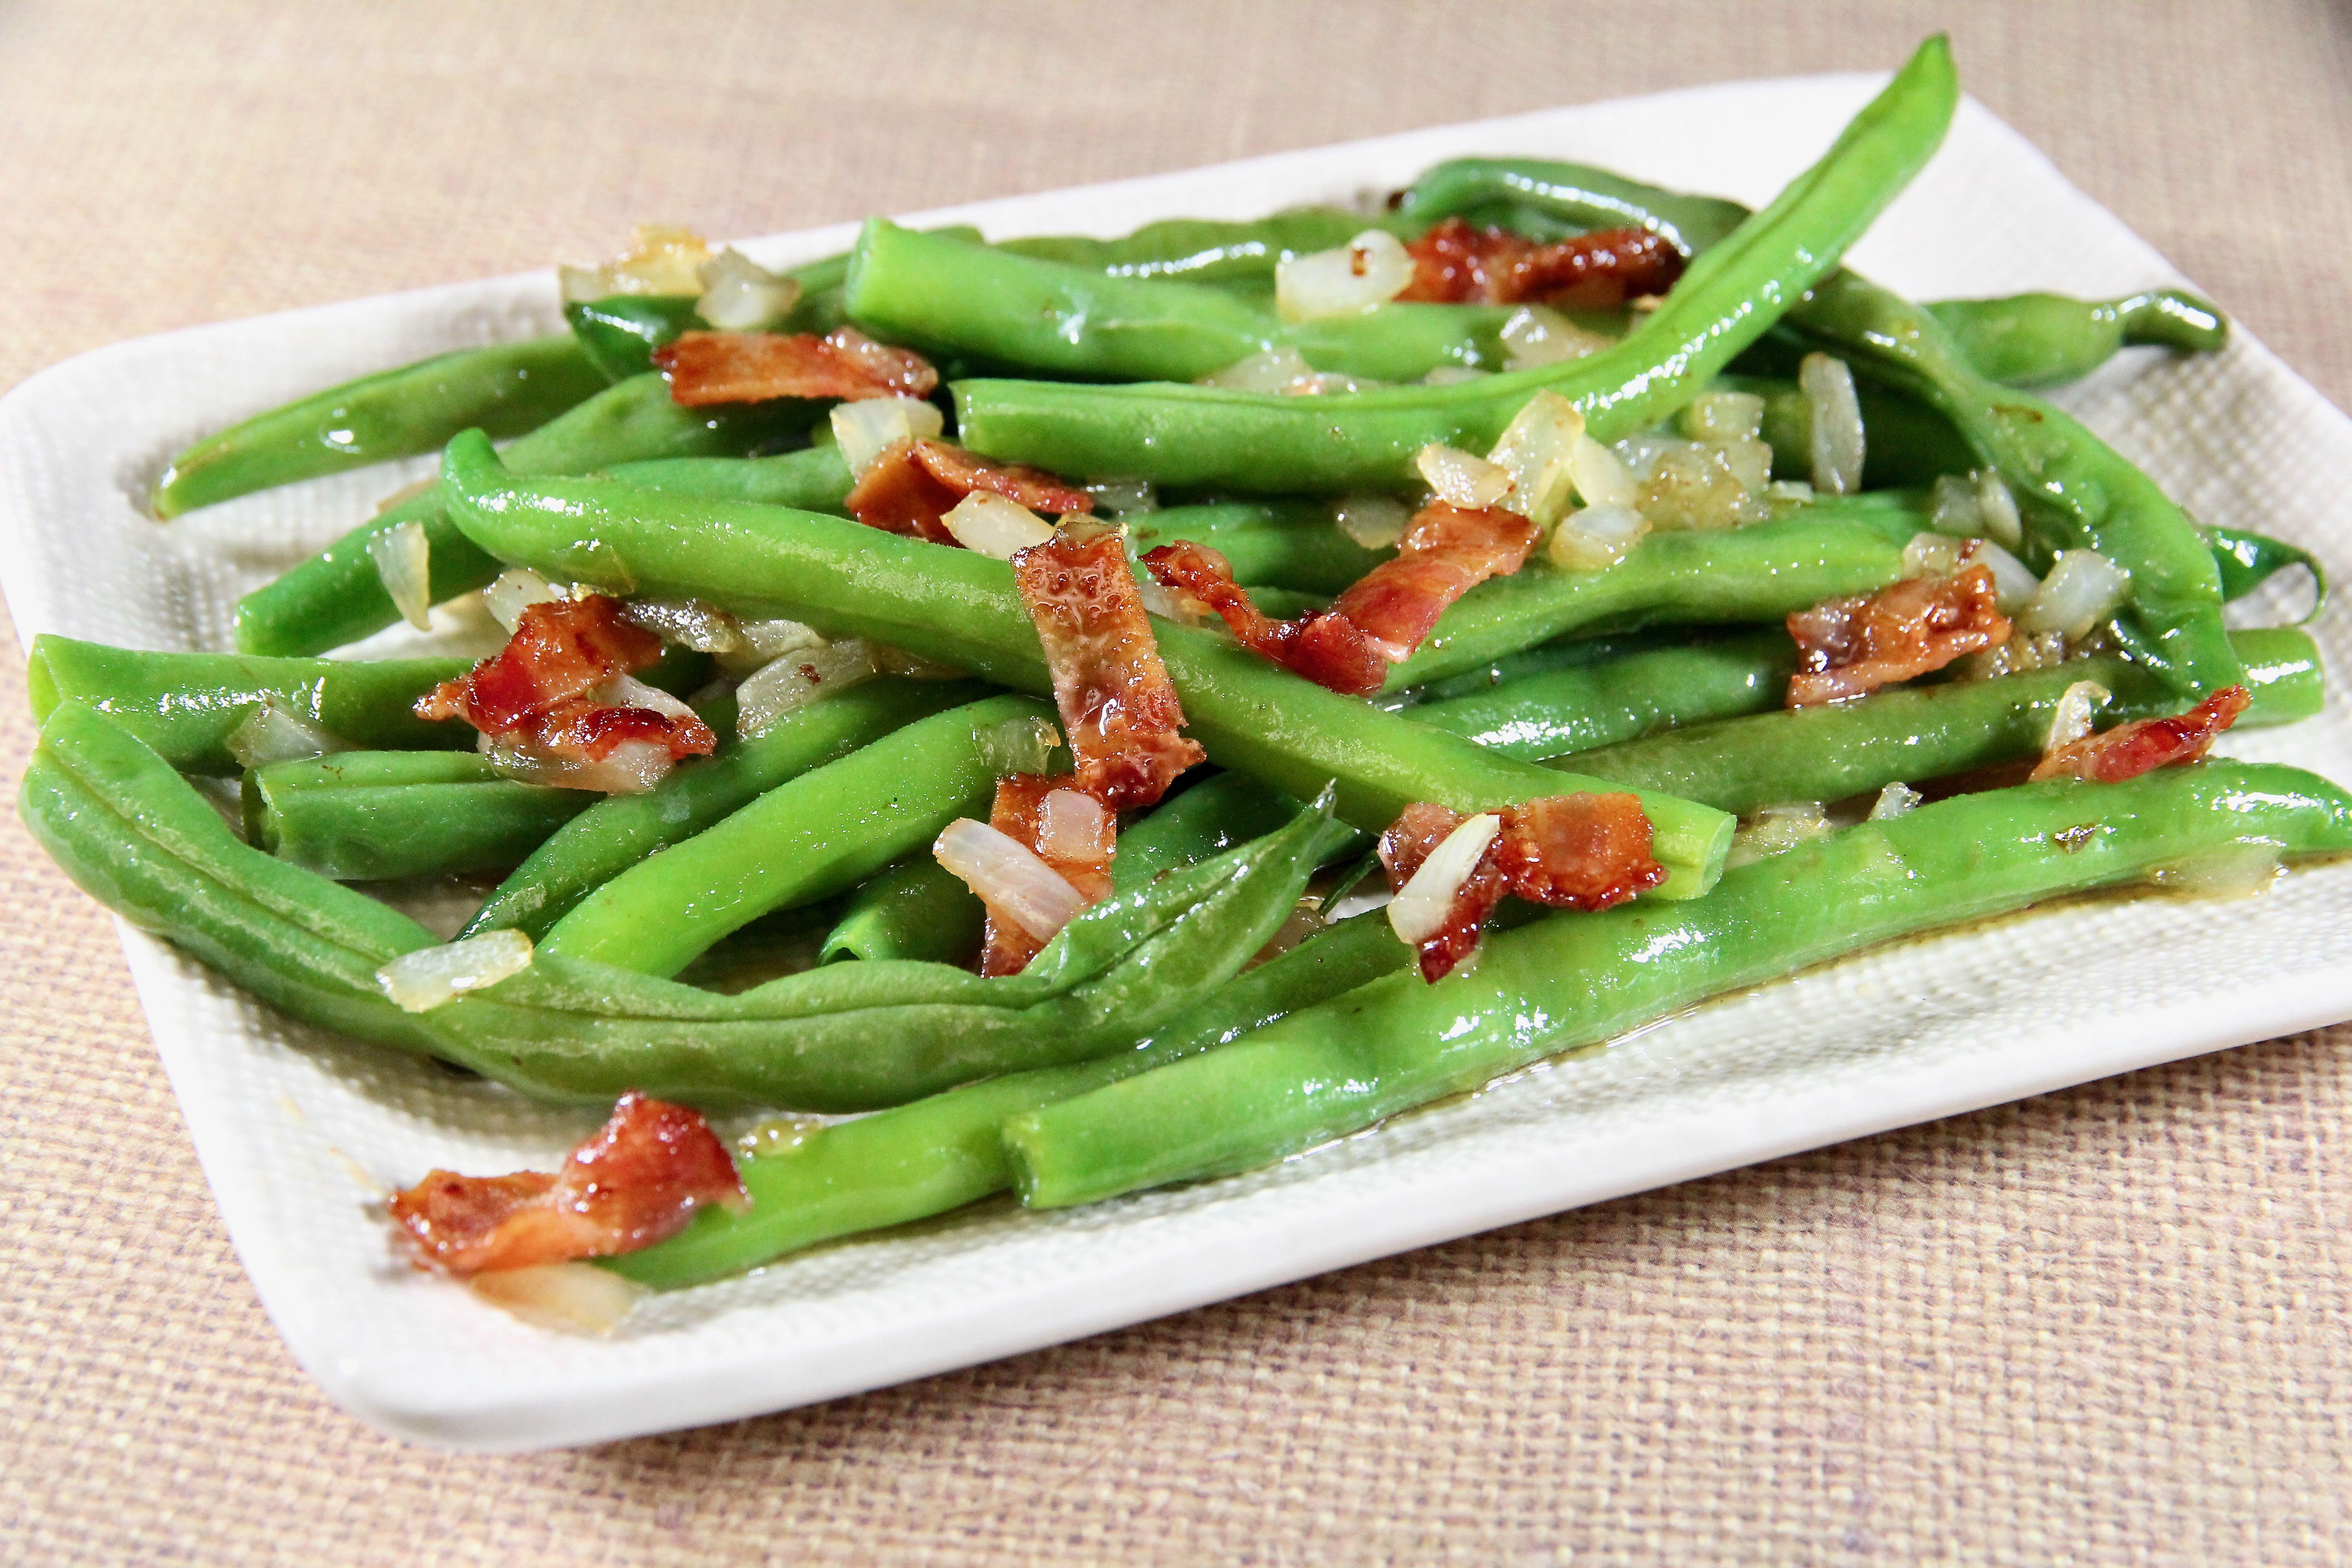 Grandma's Green Beans with Bacon Vinaigrette